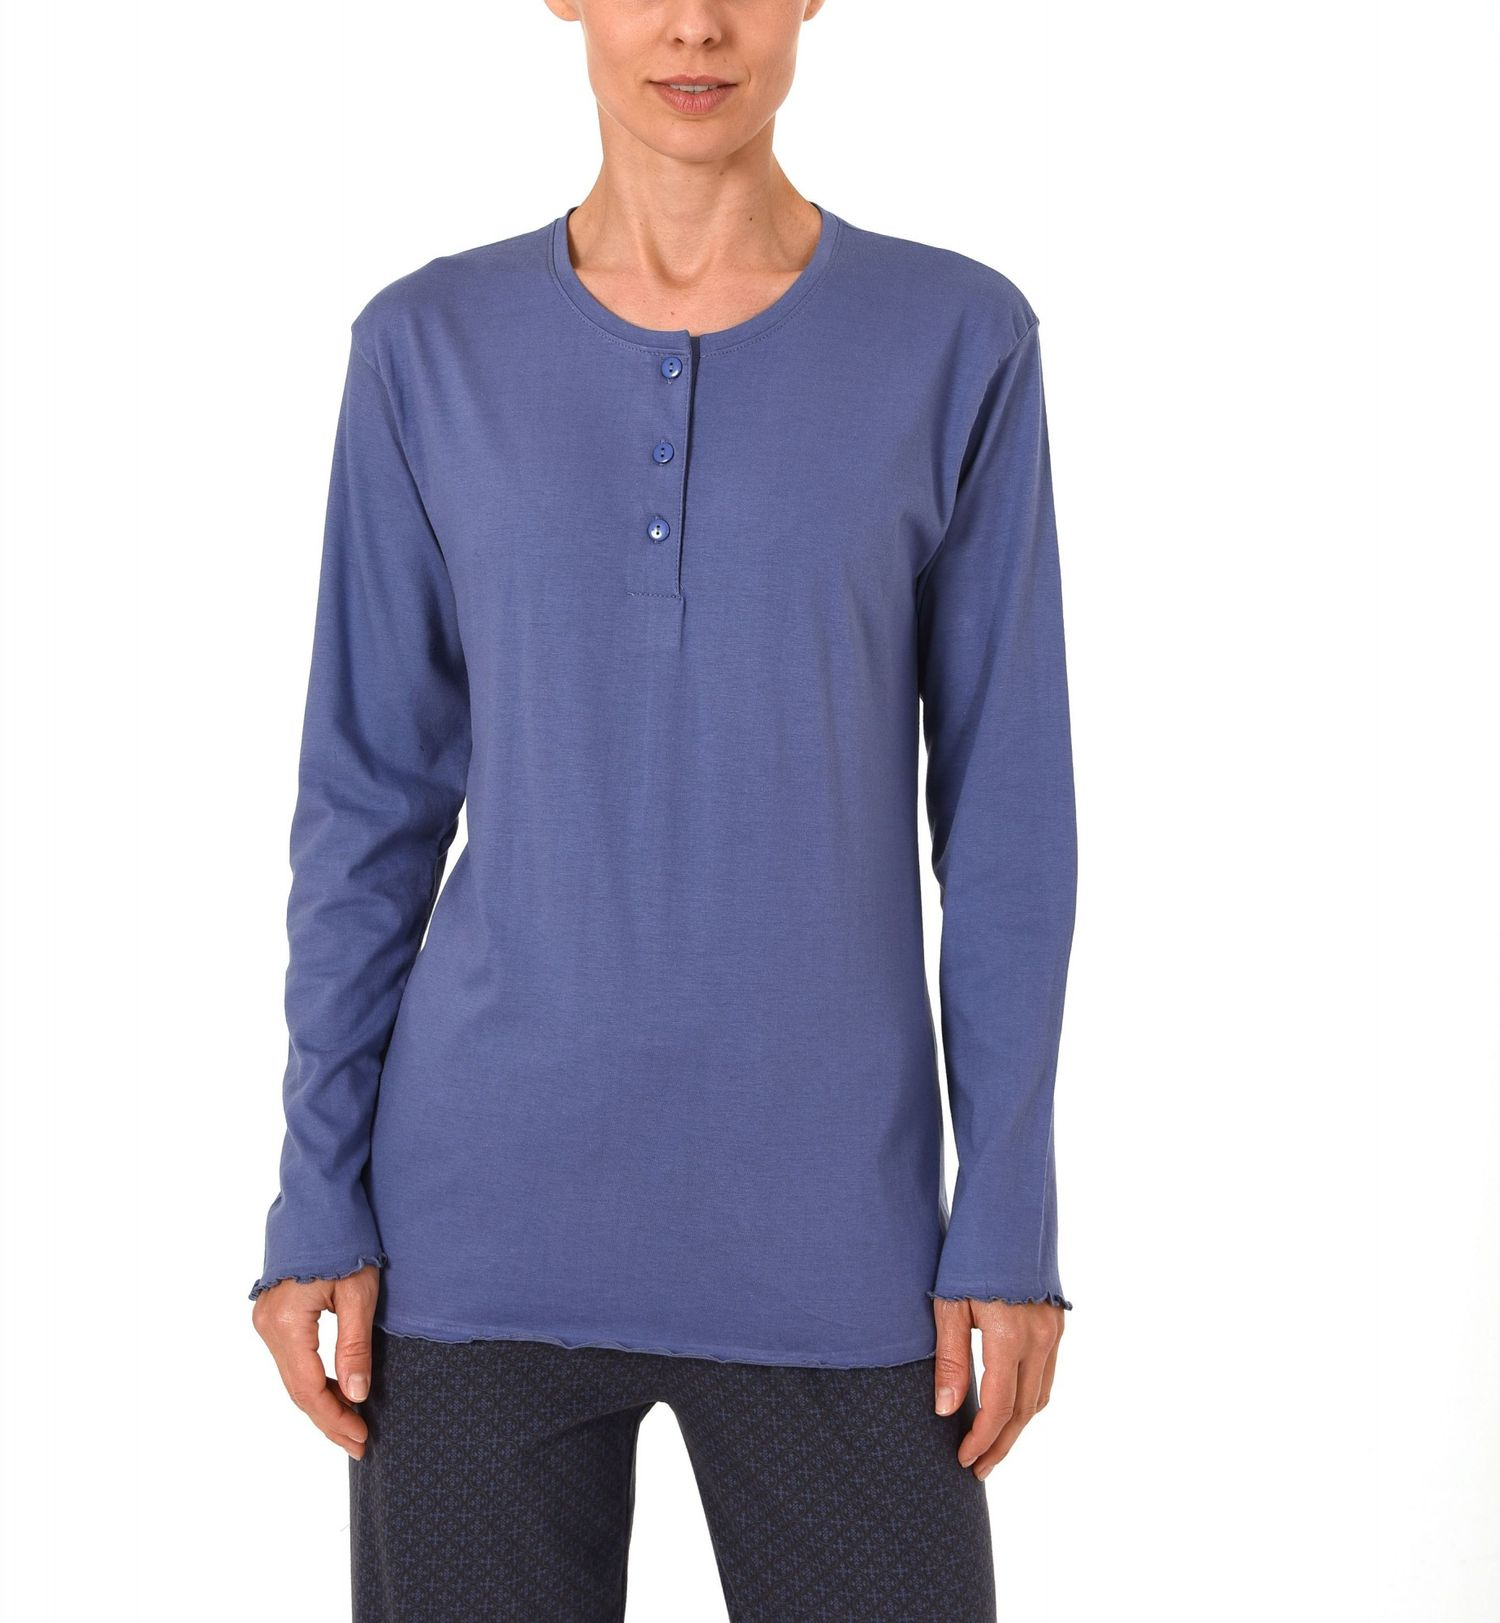 Damen Shirt - Oberteil langarm Mix & Match blau, grau oder beere – 271 219 90 102 – Bild 4